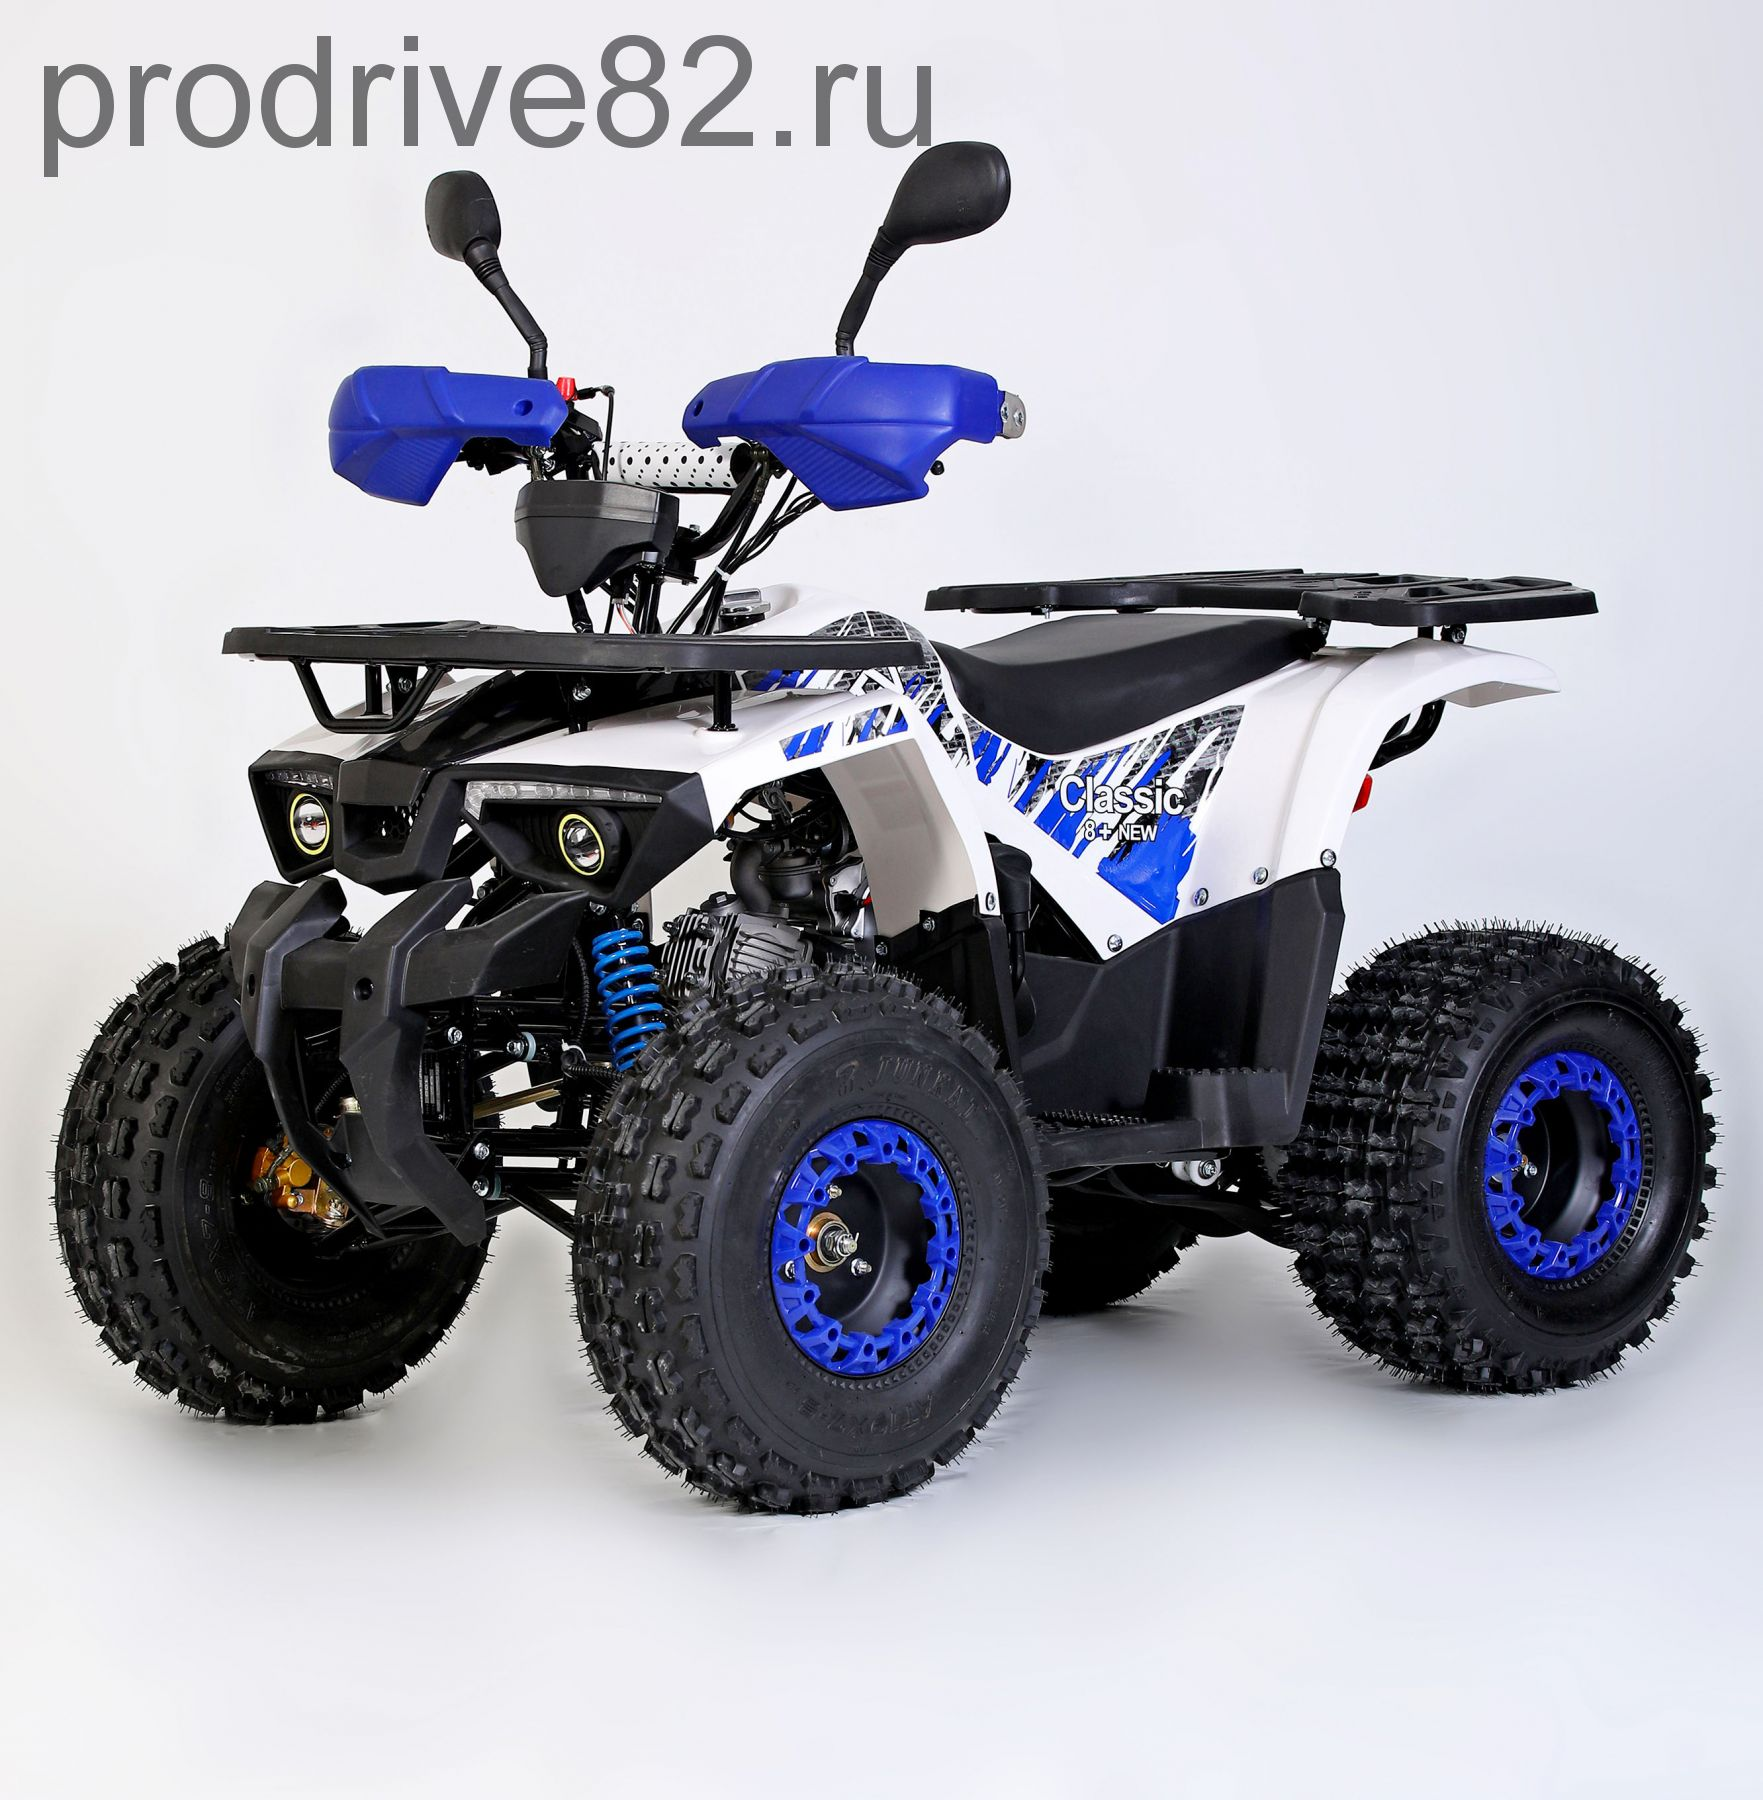 Avantis Classic 8+ 125 New сс Квадроцикл бензиновый